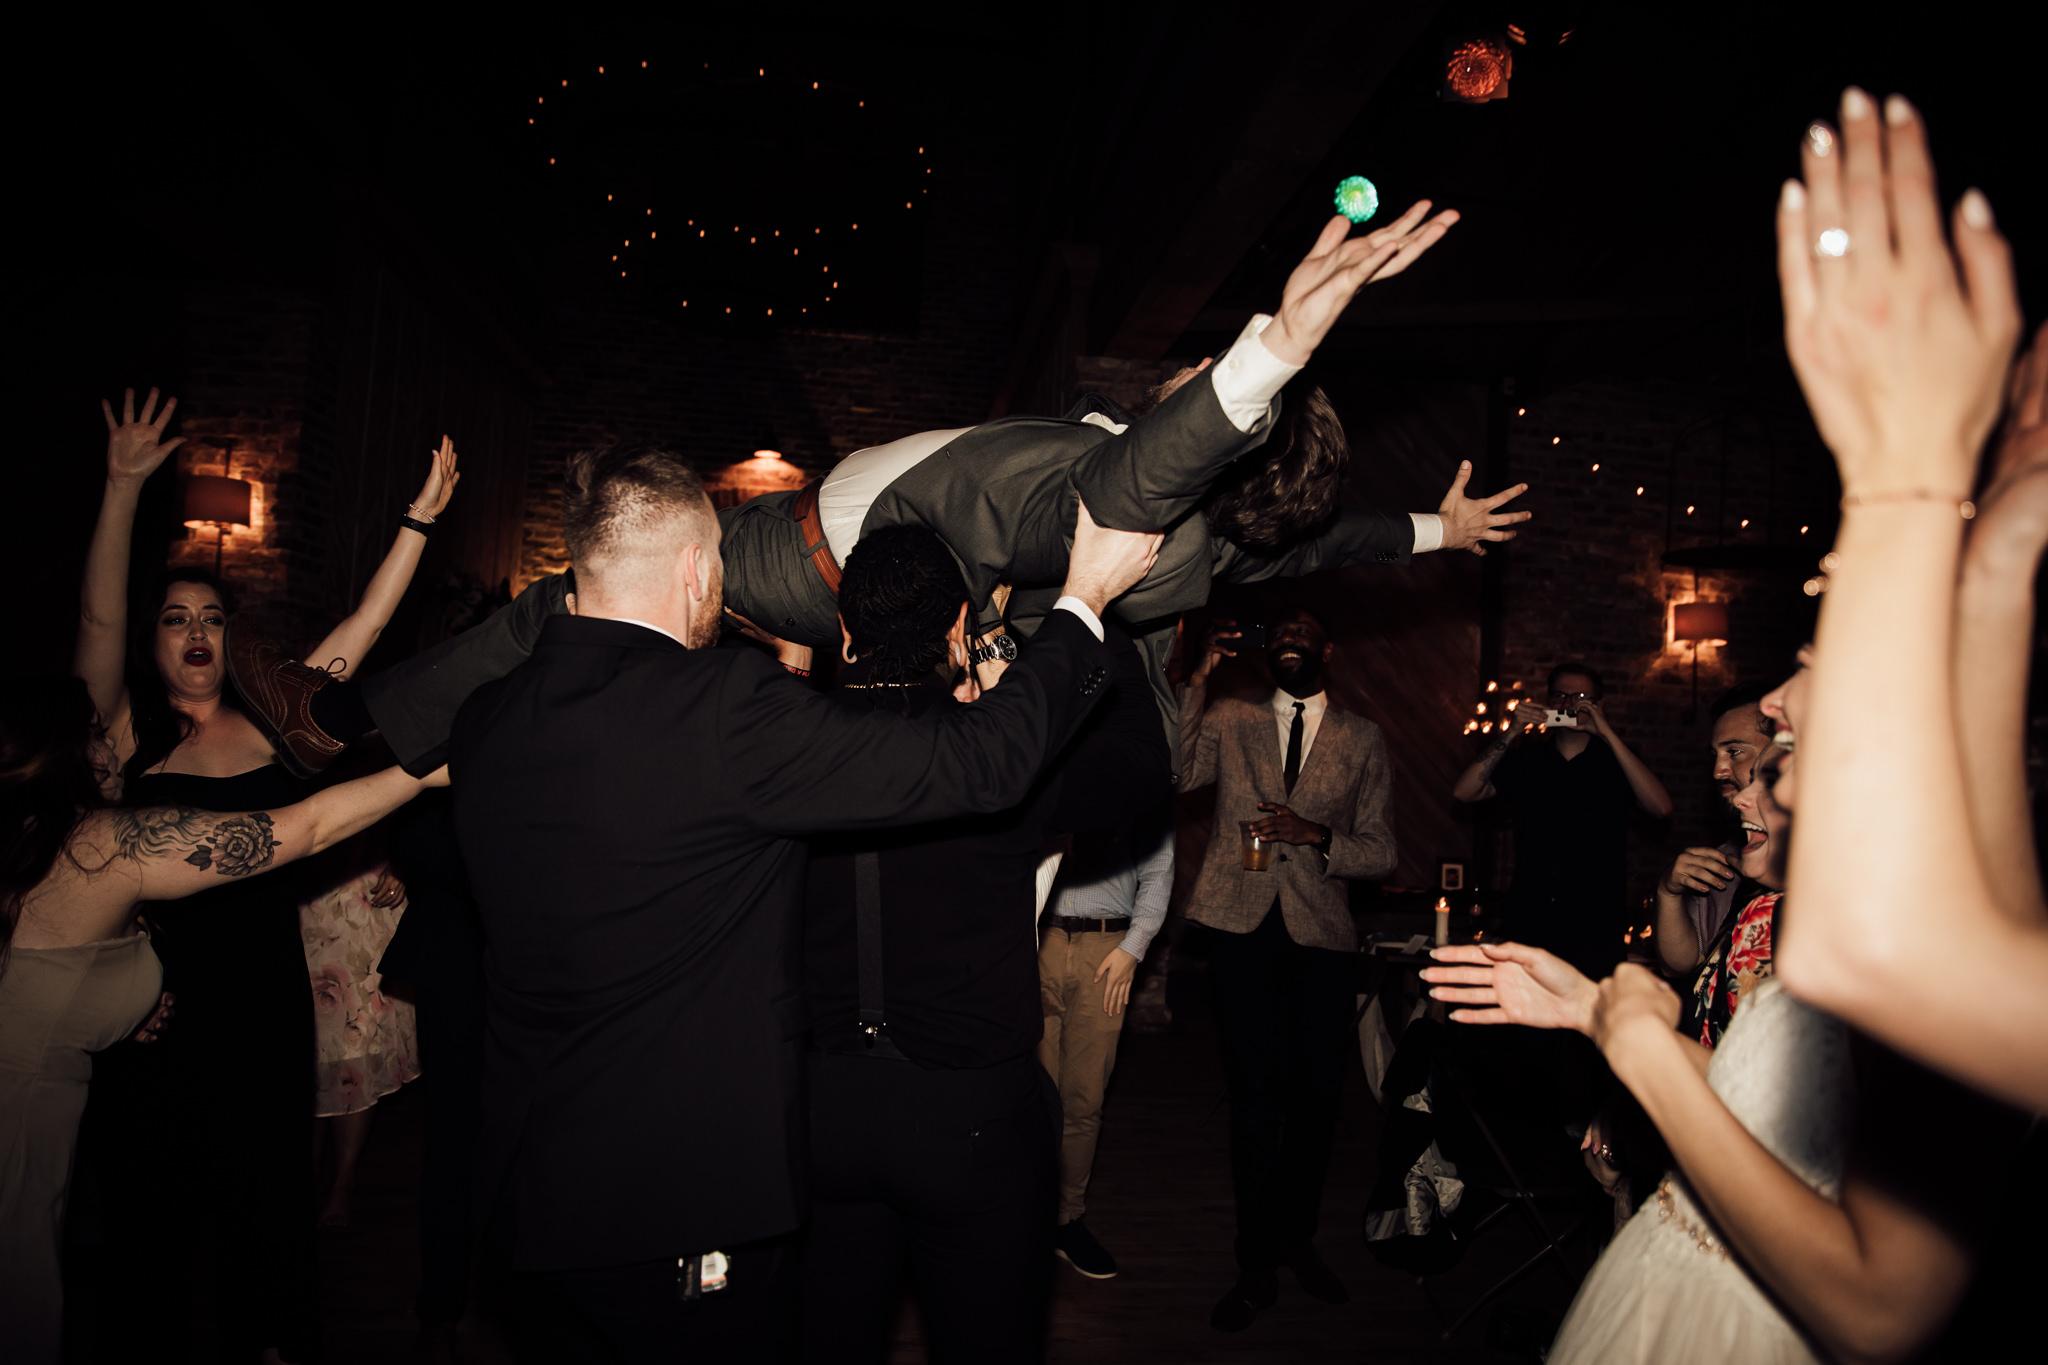 phantom-canyon-brewery-colorado-springs-wedding-photographer-484.jpg